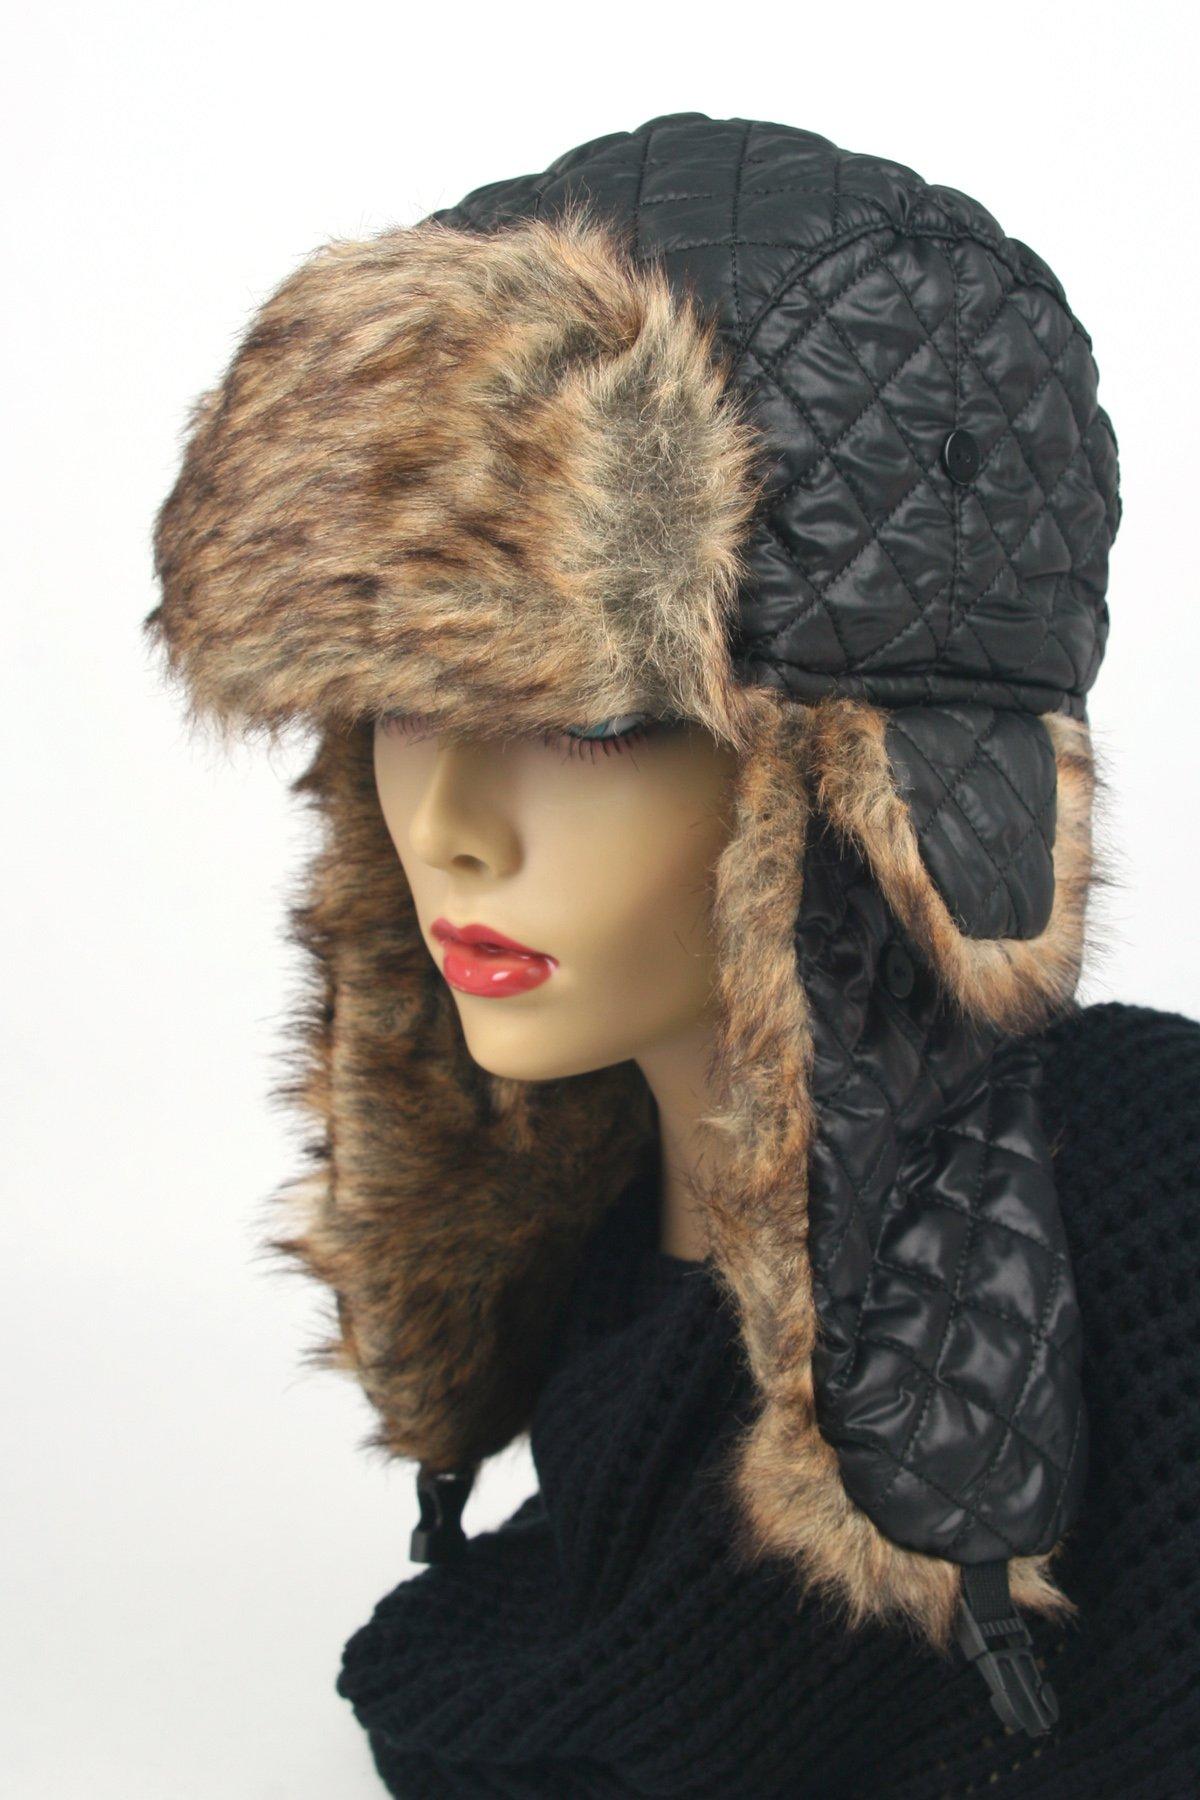 Women's Trapper Quilted Winter Ear Flap Hat 901HT (Black)